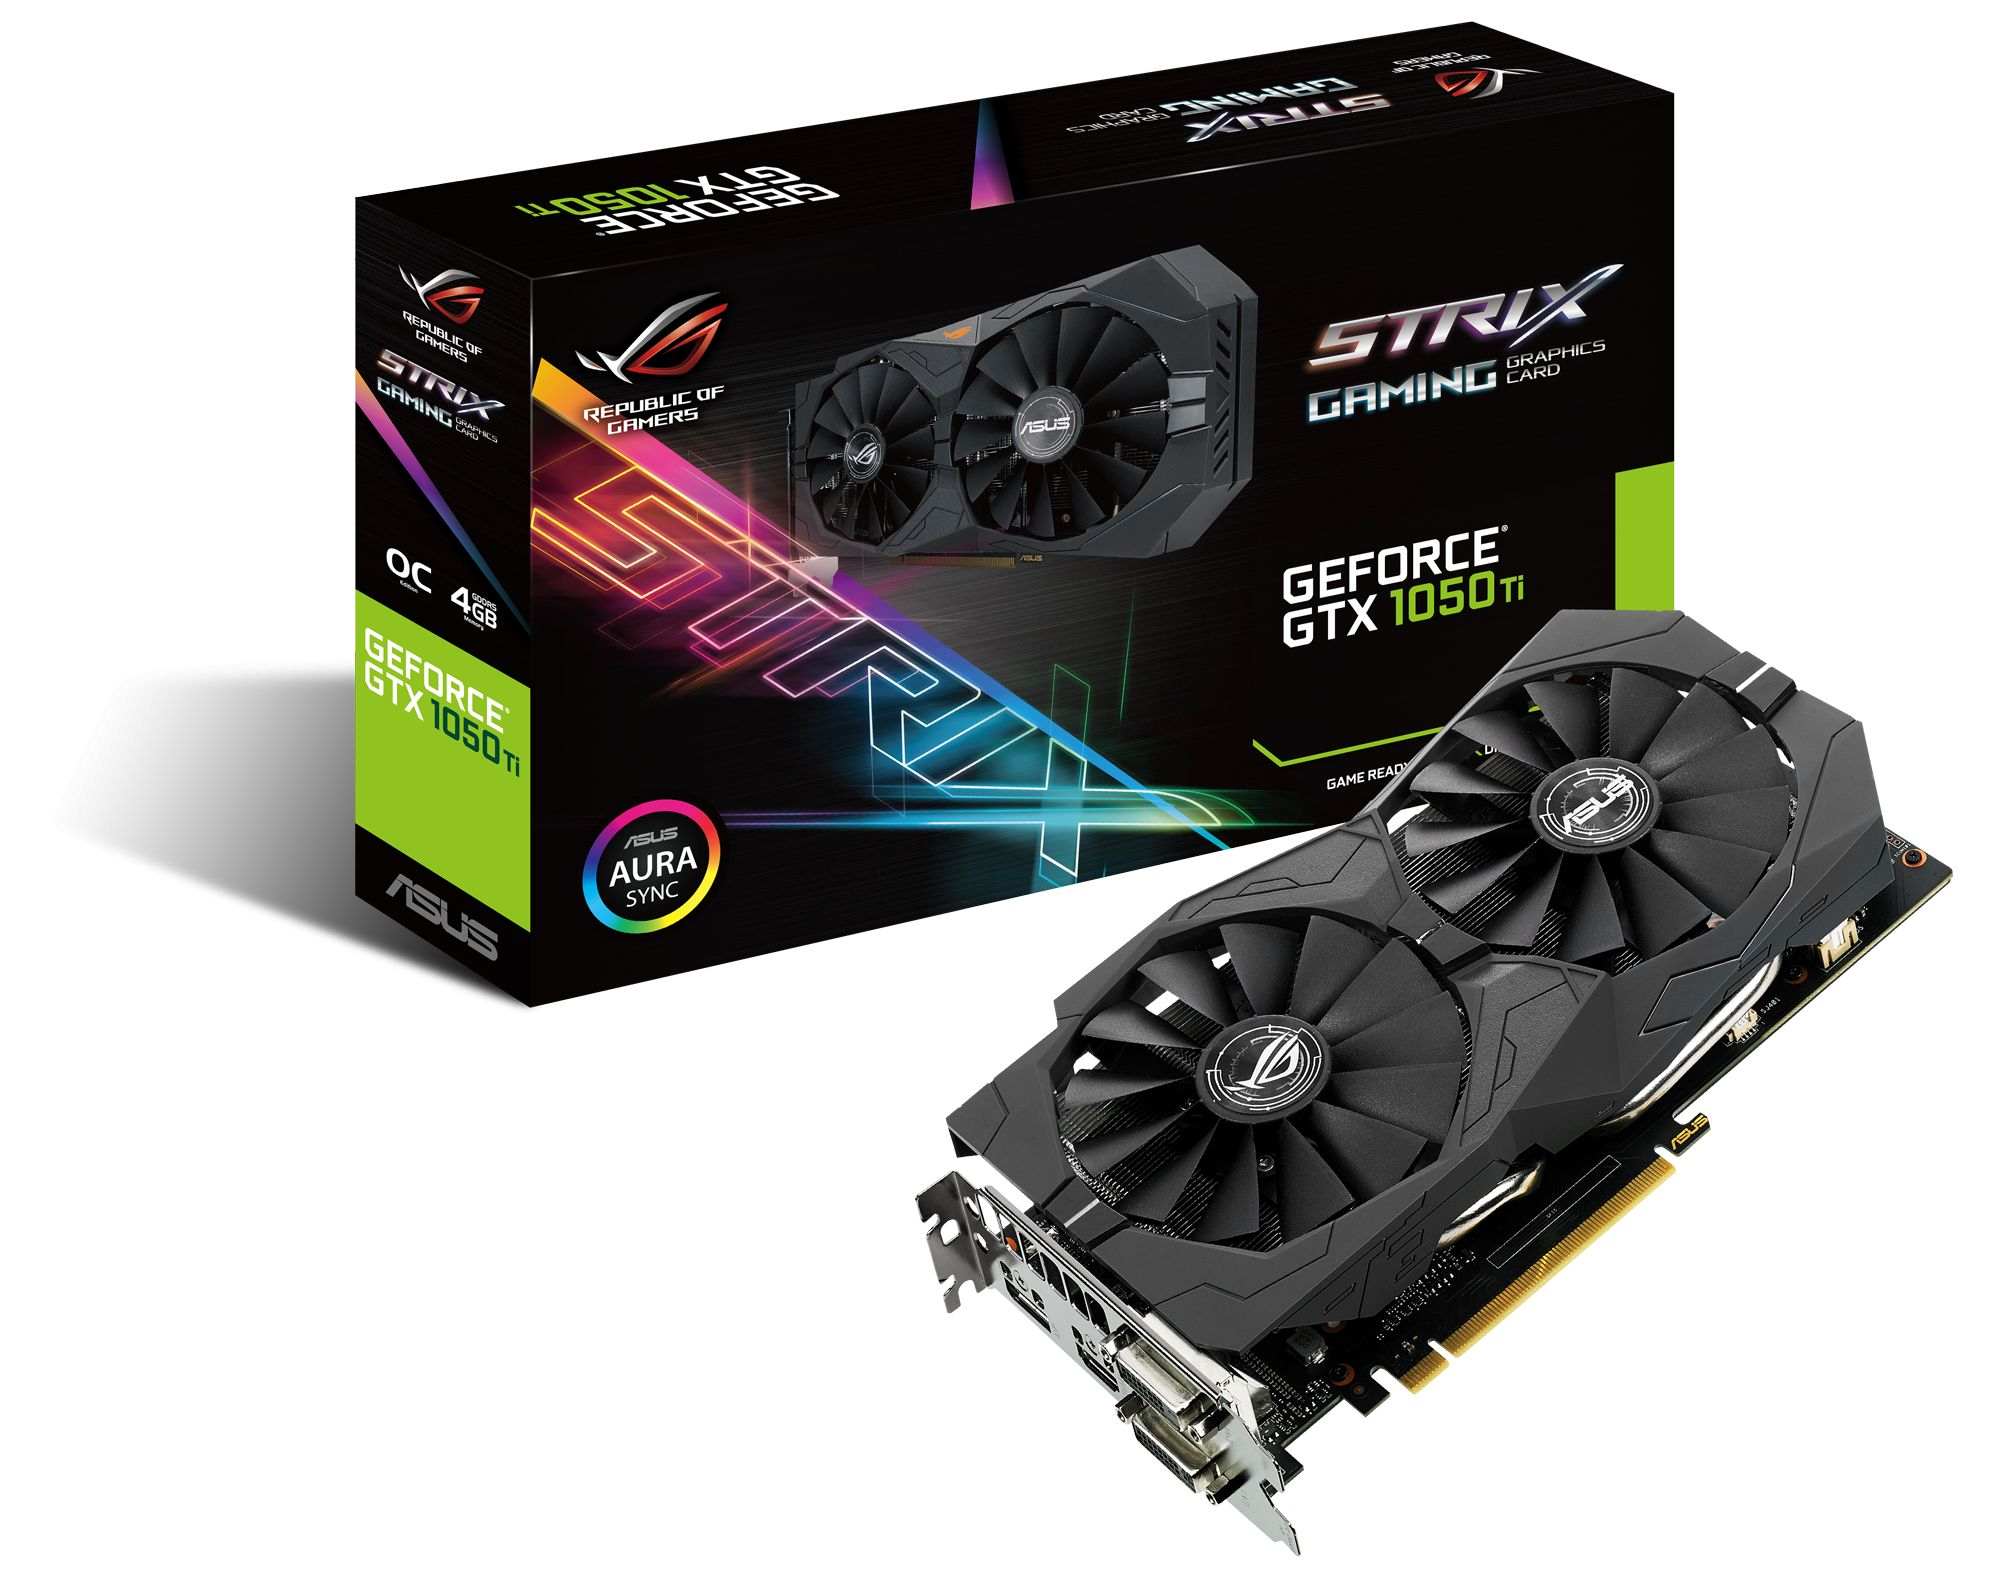 ASUS STRIX GeForce GTX 1080 Ti 4GB OC